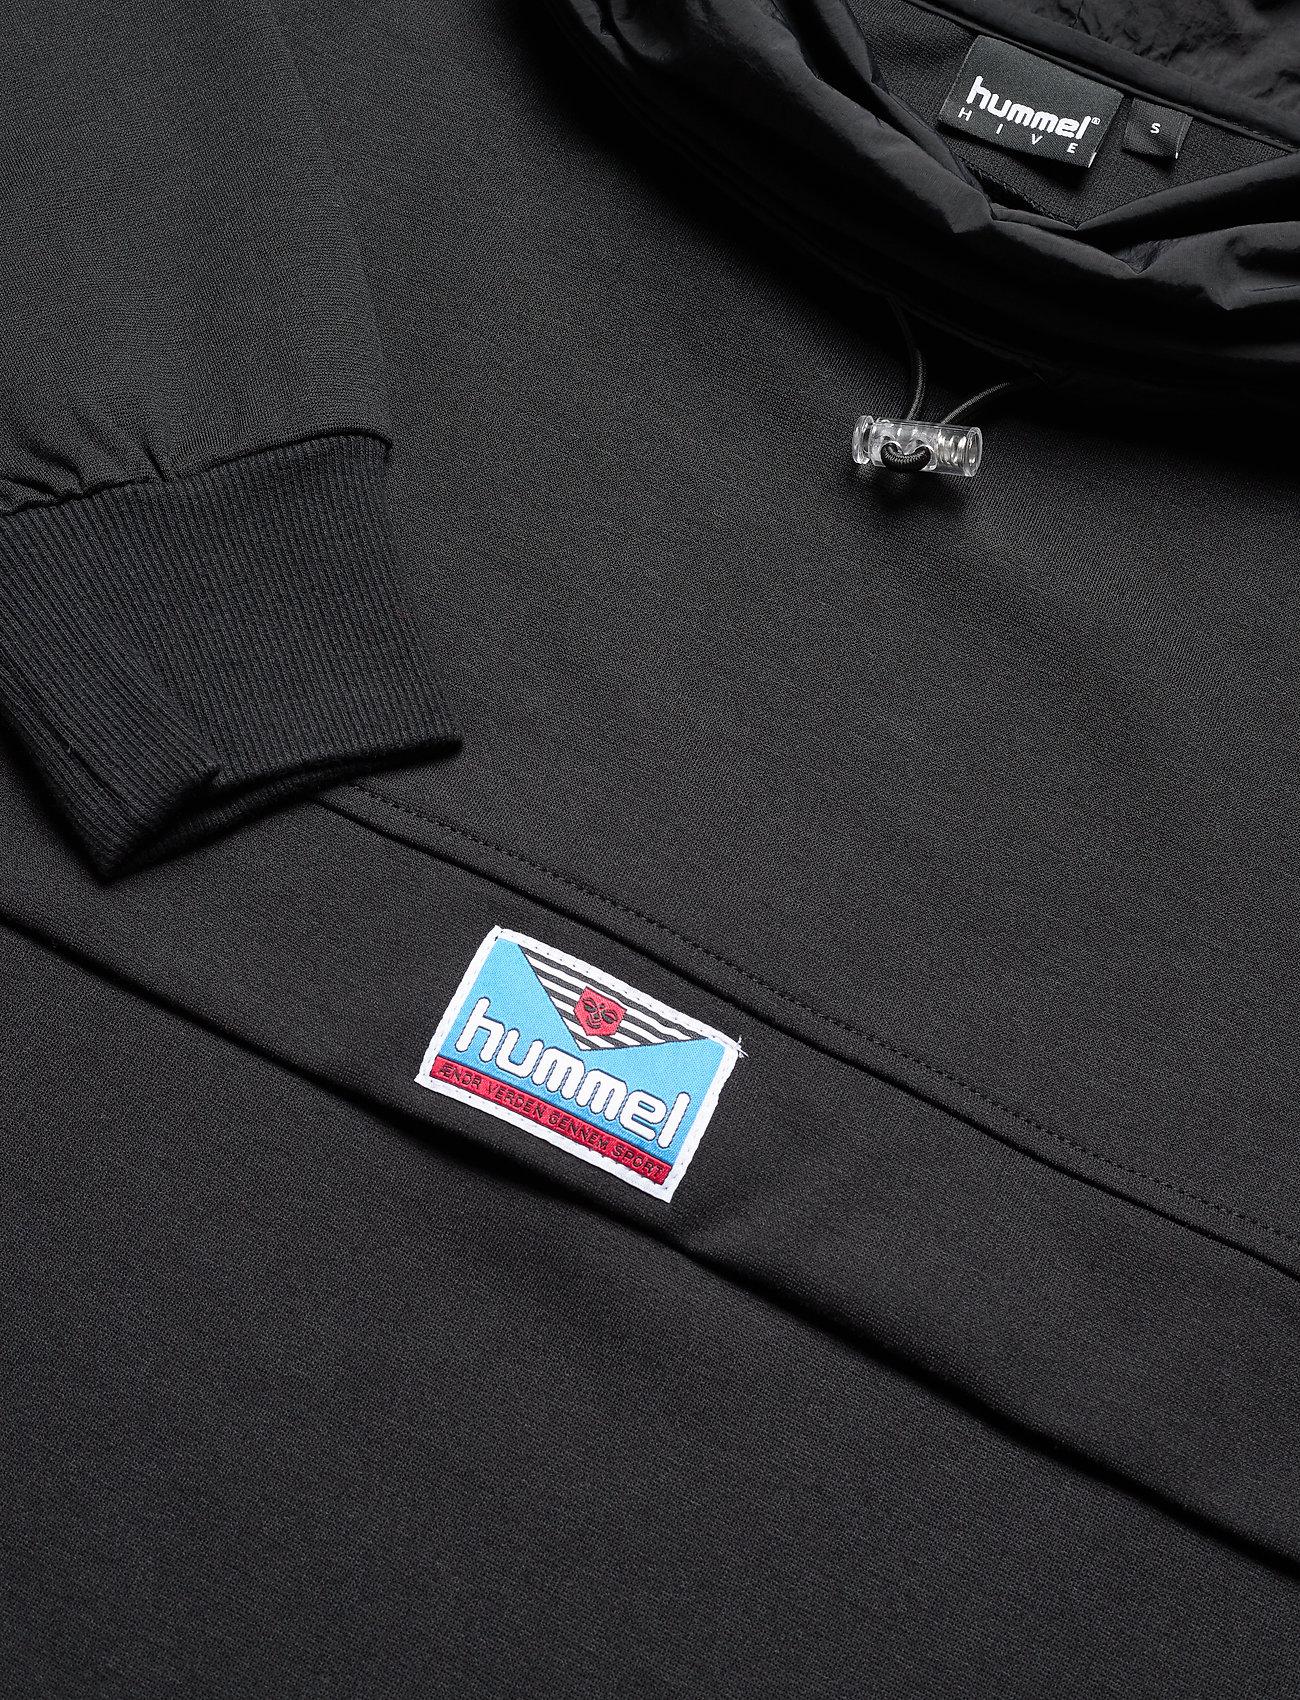 Hmlcatinka Sweatshirt (Black) (800 kr) - Hummel Hive